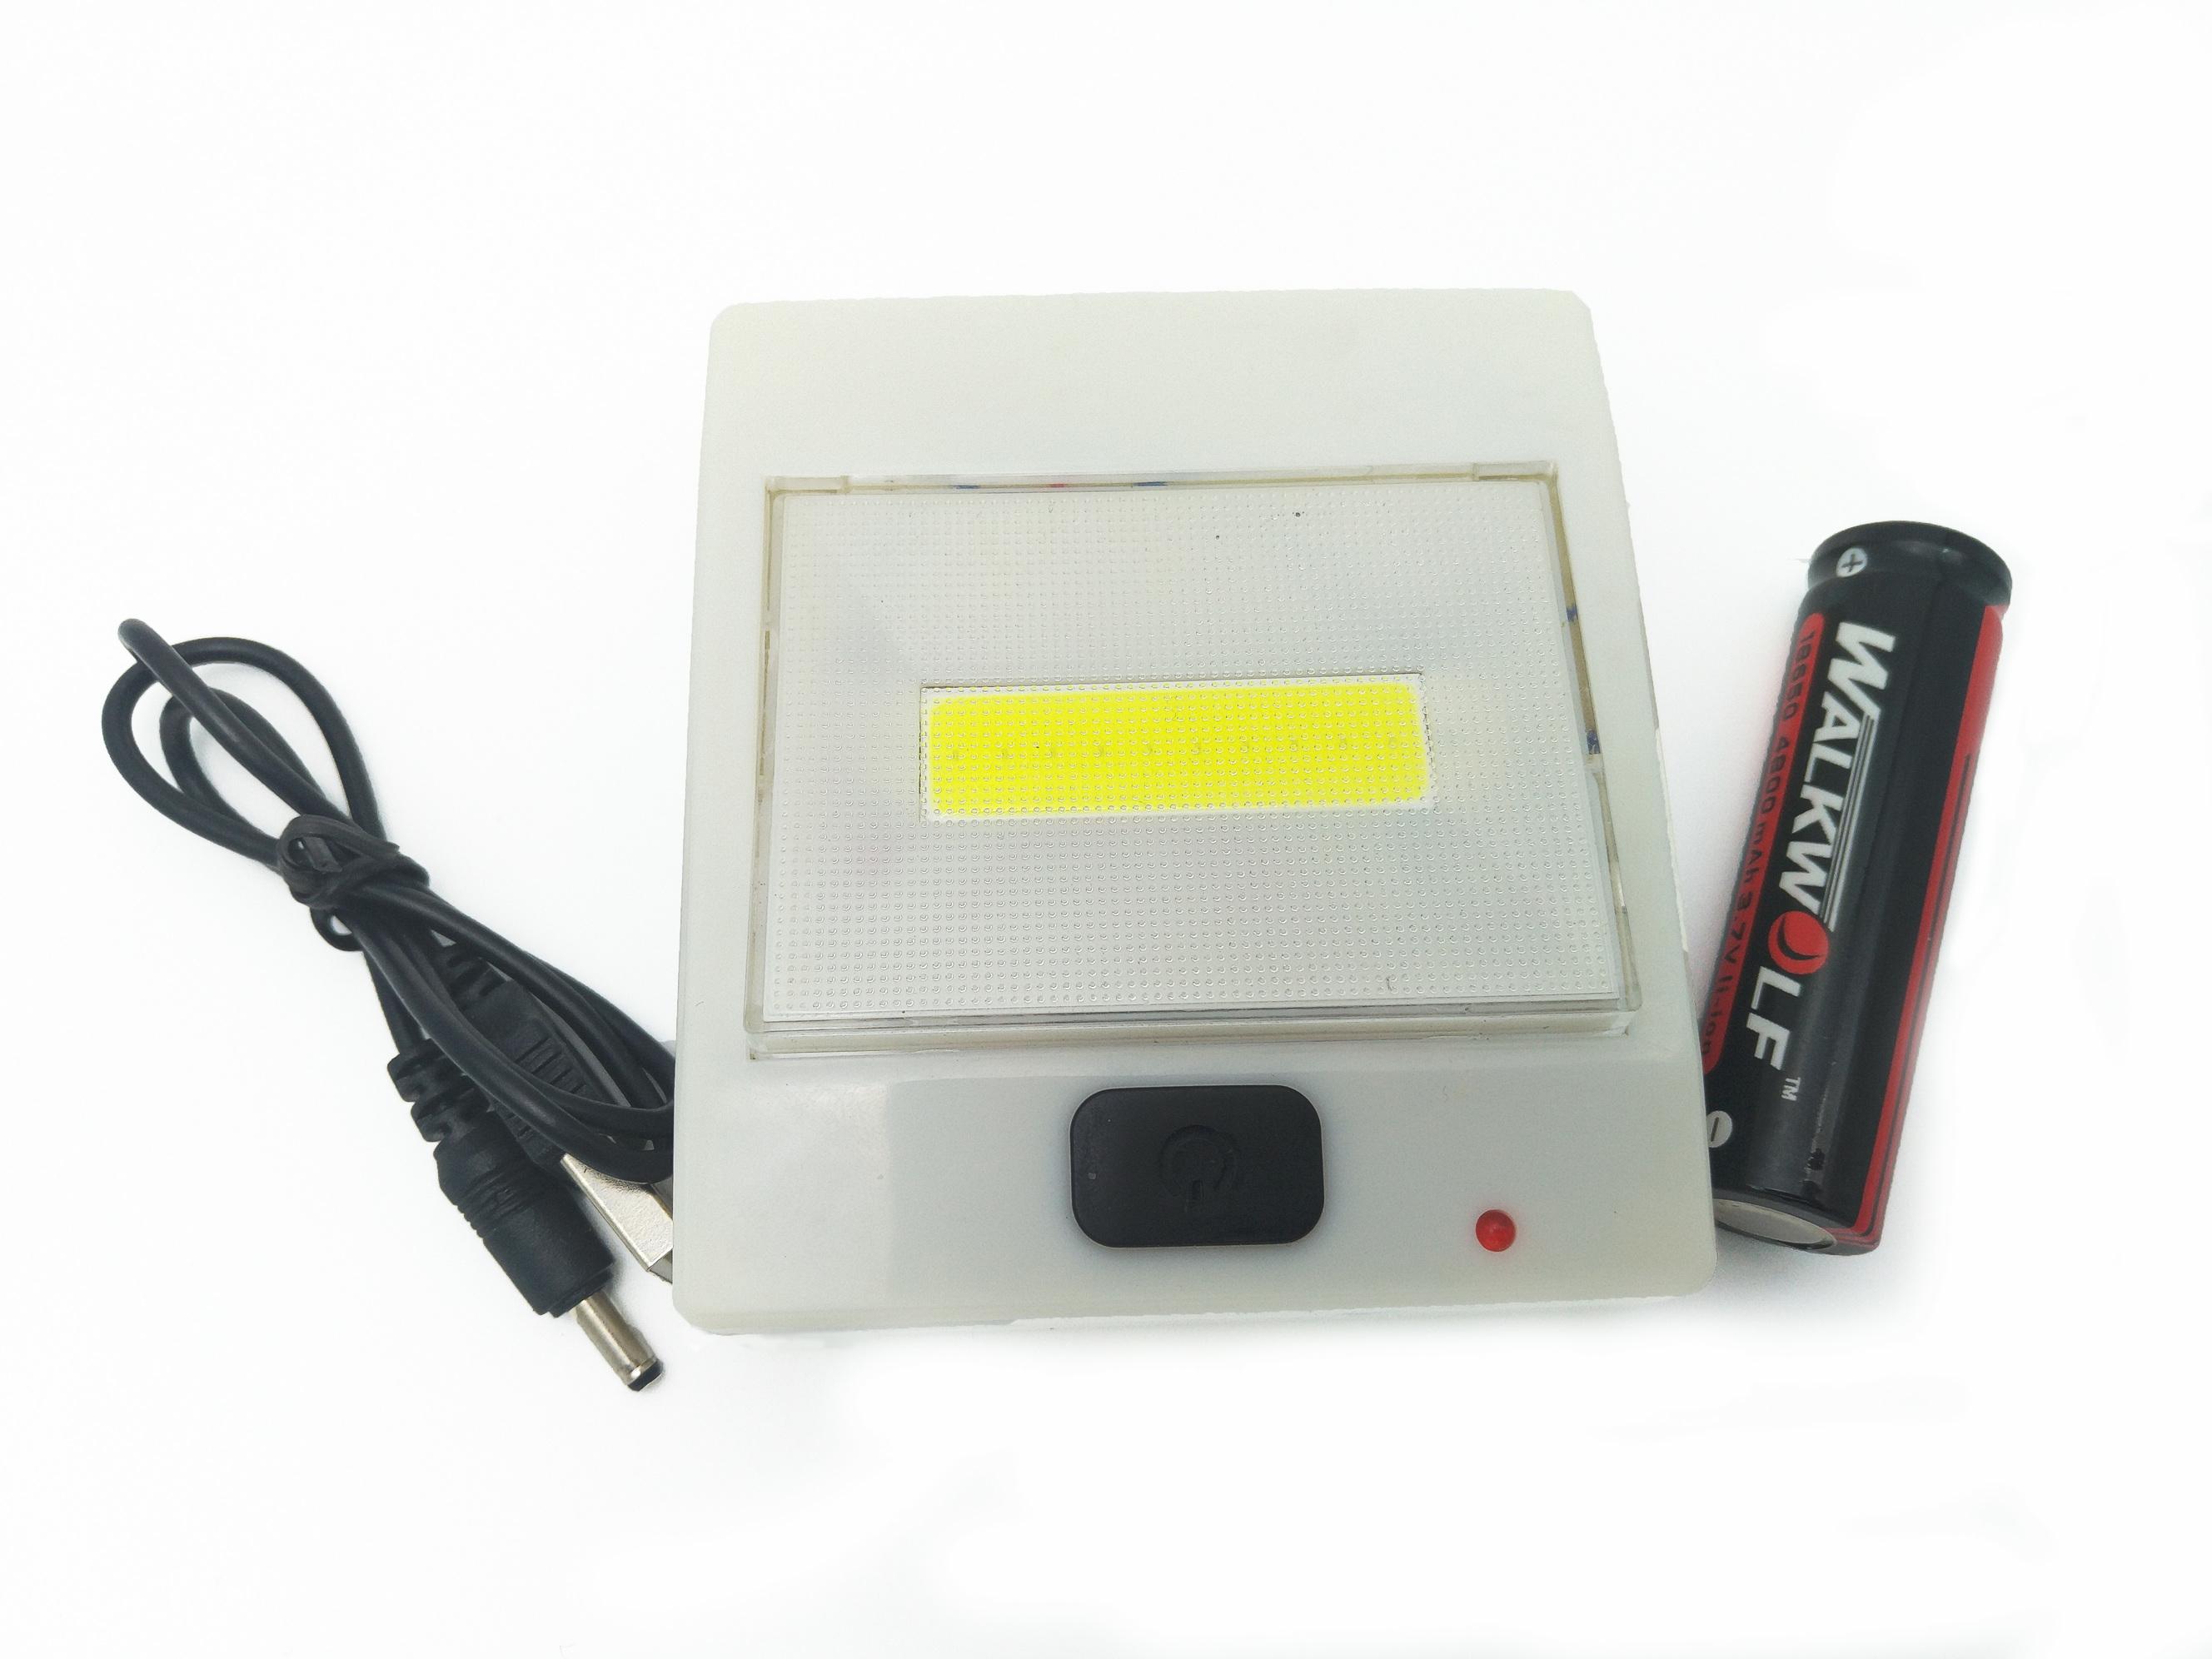 Lanterna Lampa de Veghe COB cu LED 5W, lumina Alba Rece cu acumulator 3.7V, Alb